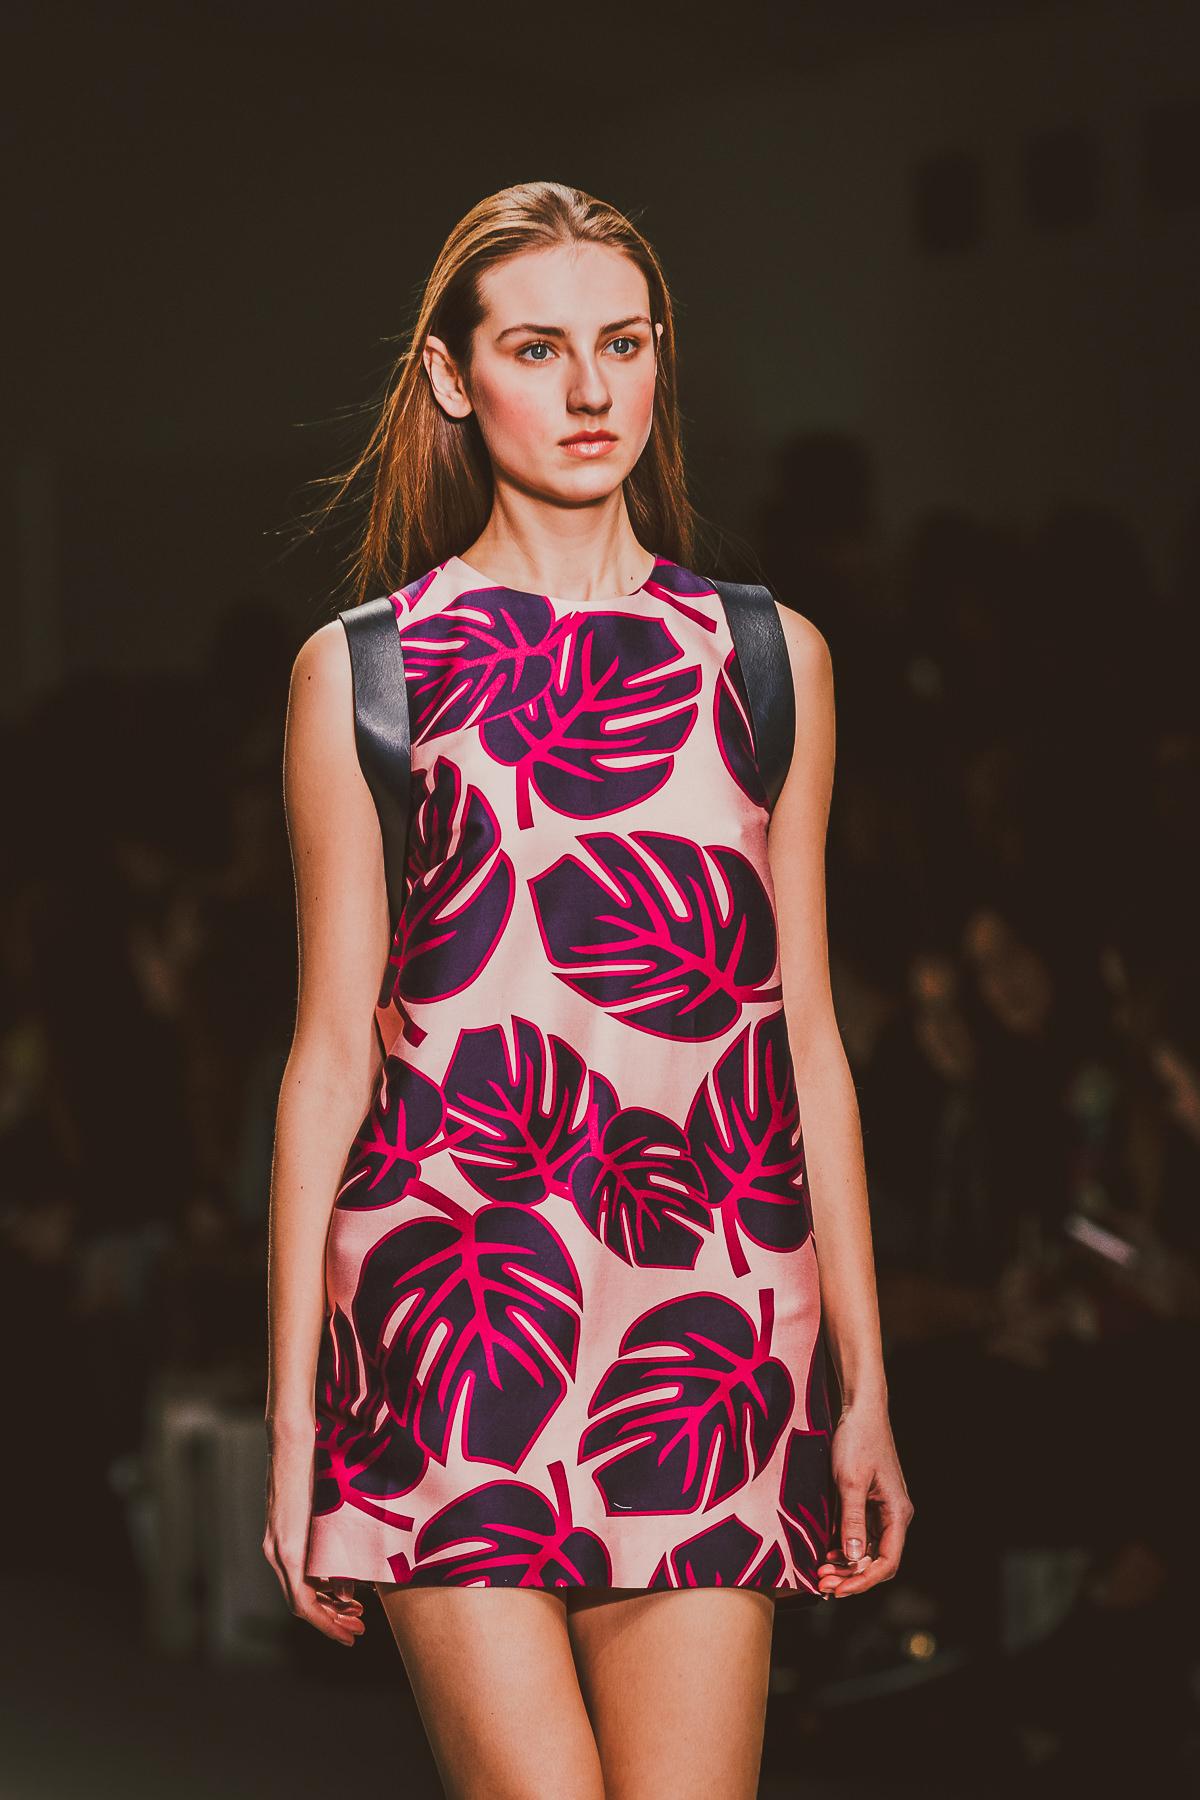 003 - London Fashion Week